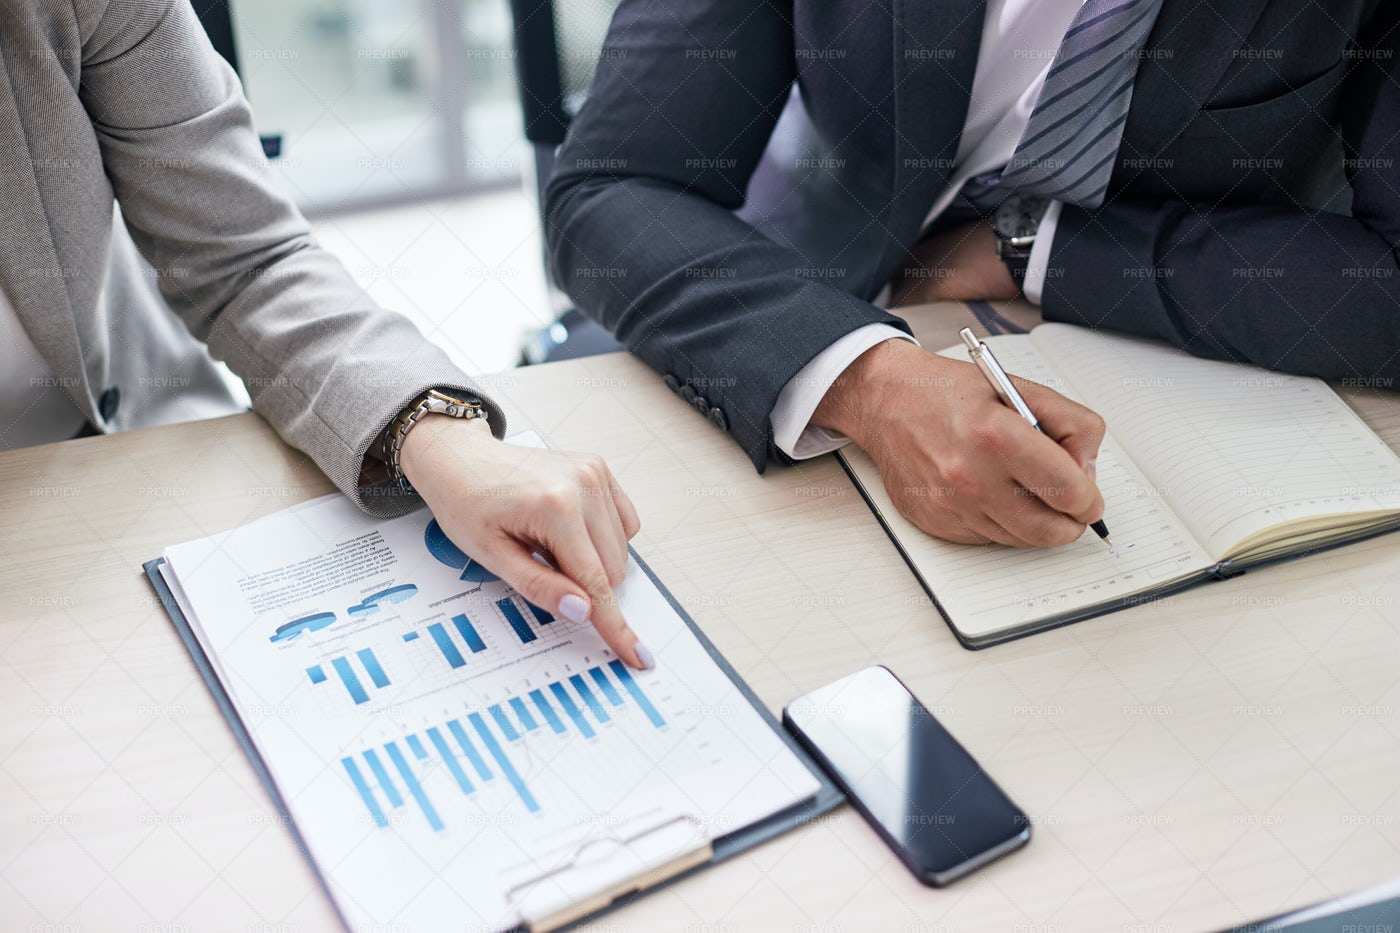 Studying Financial Figures: Stock Photos